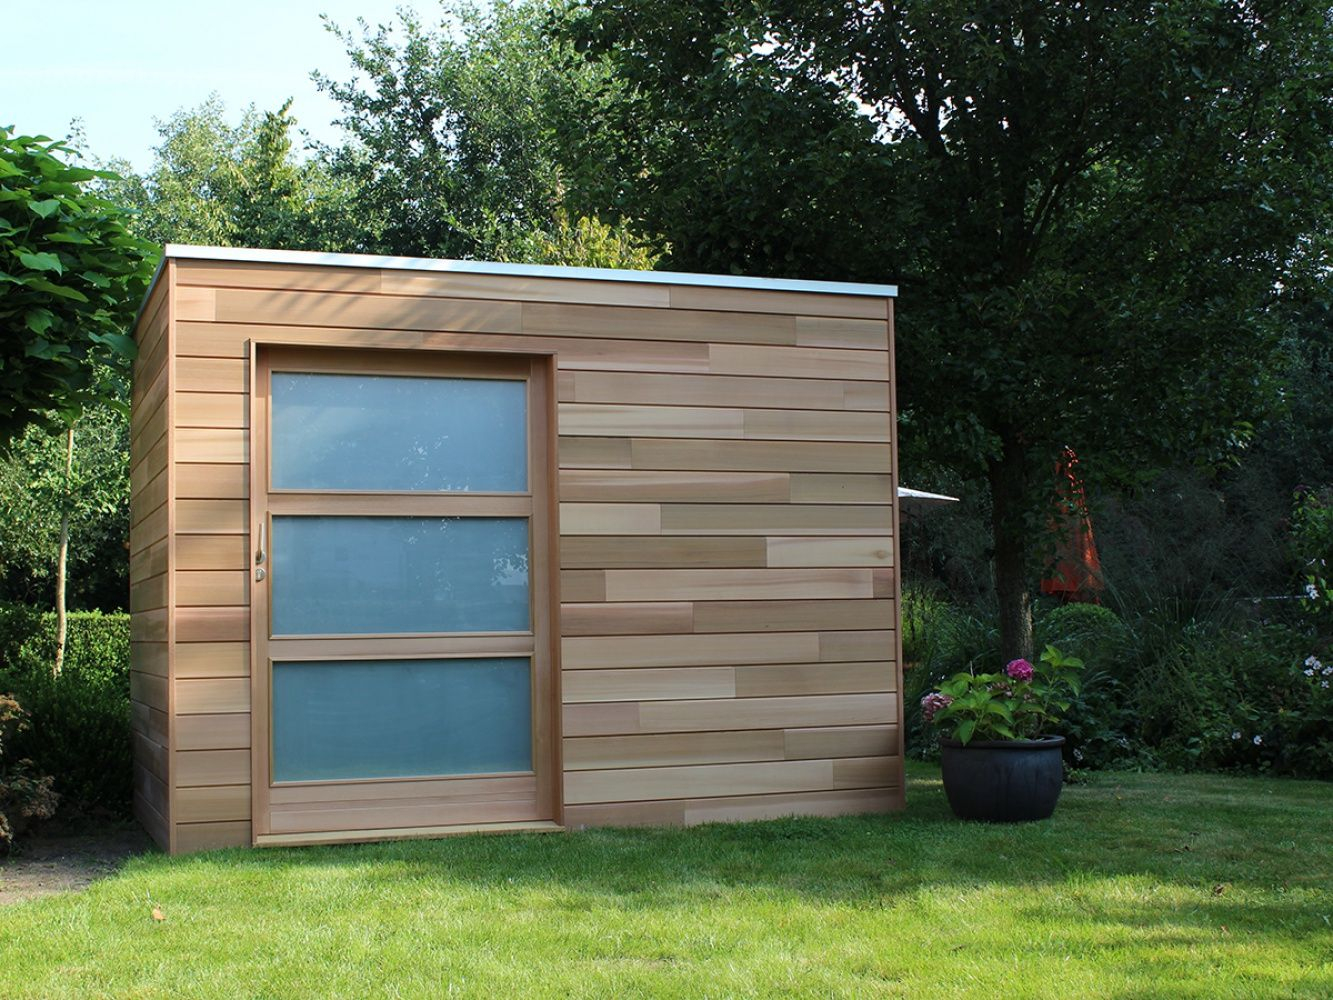 Cubeco Modern Houten Tuinhuis | Abri De Jardin, Jardin ... concernant Abri De Jardin Contemporain